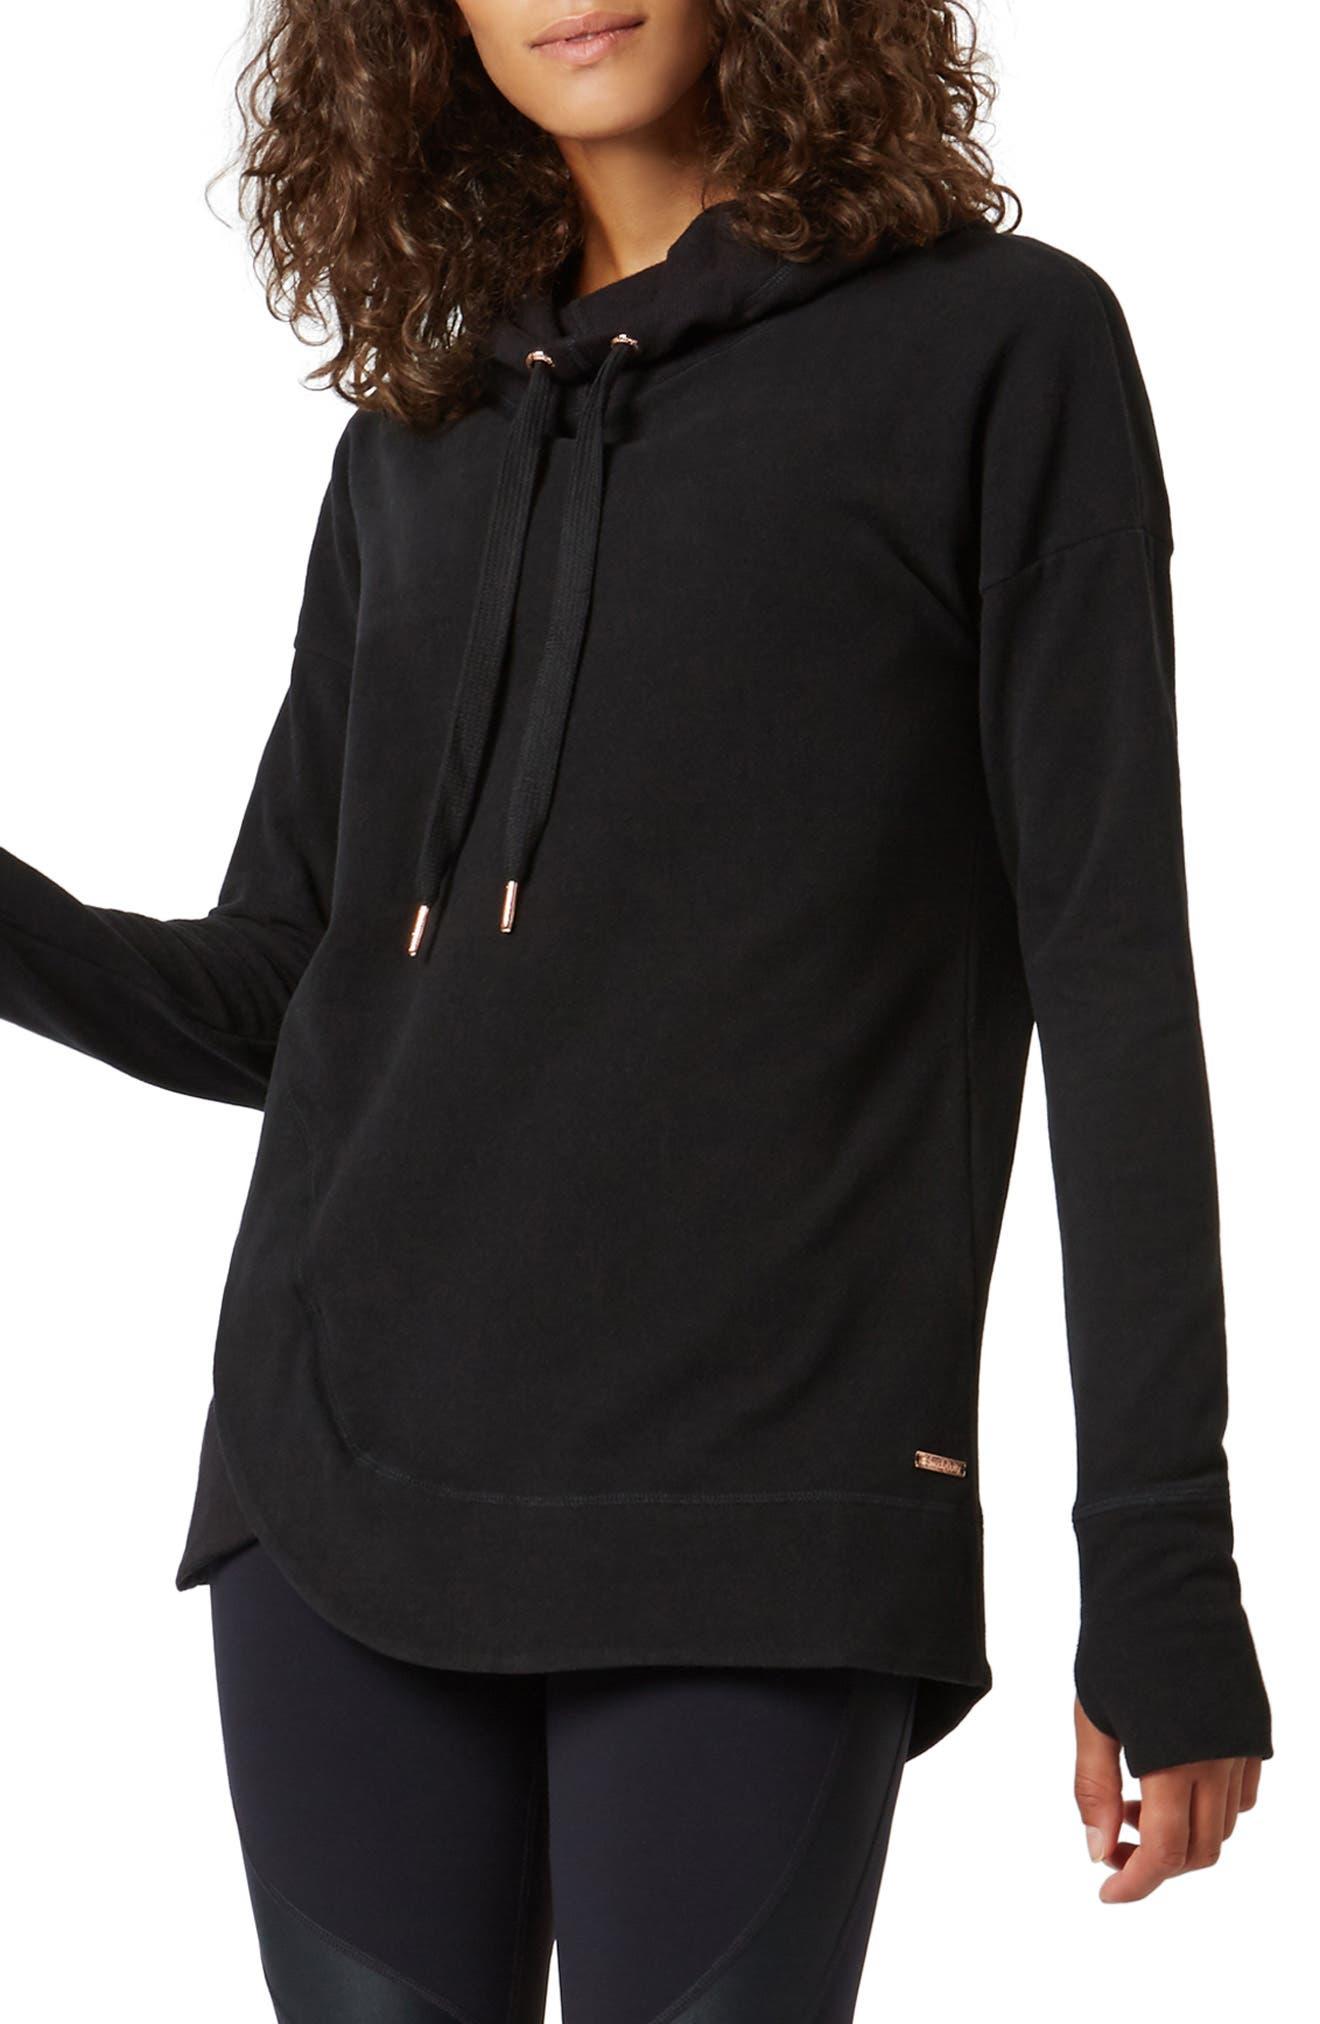 SWEATY BETTY Invigorate Luxe Hoodie, Main, color, BLACK